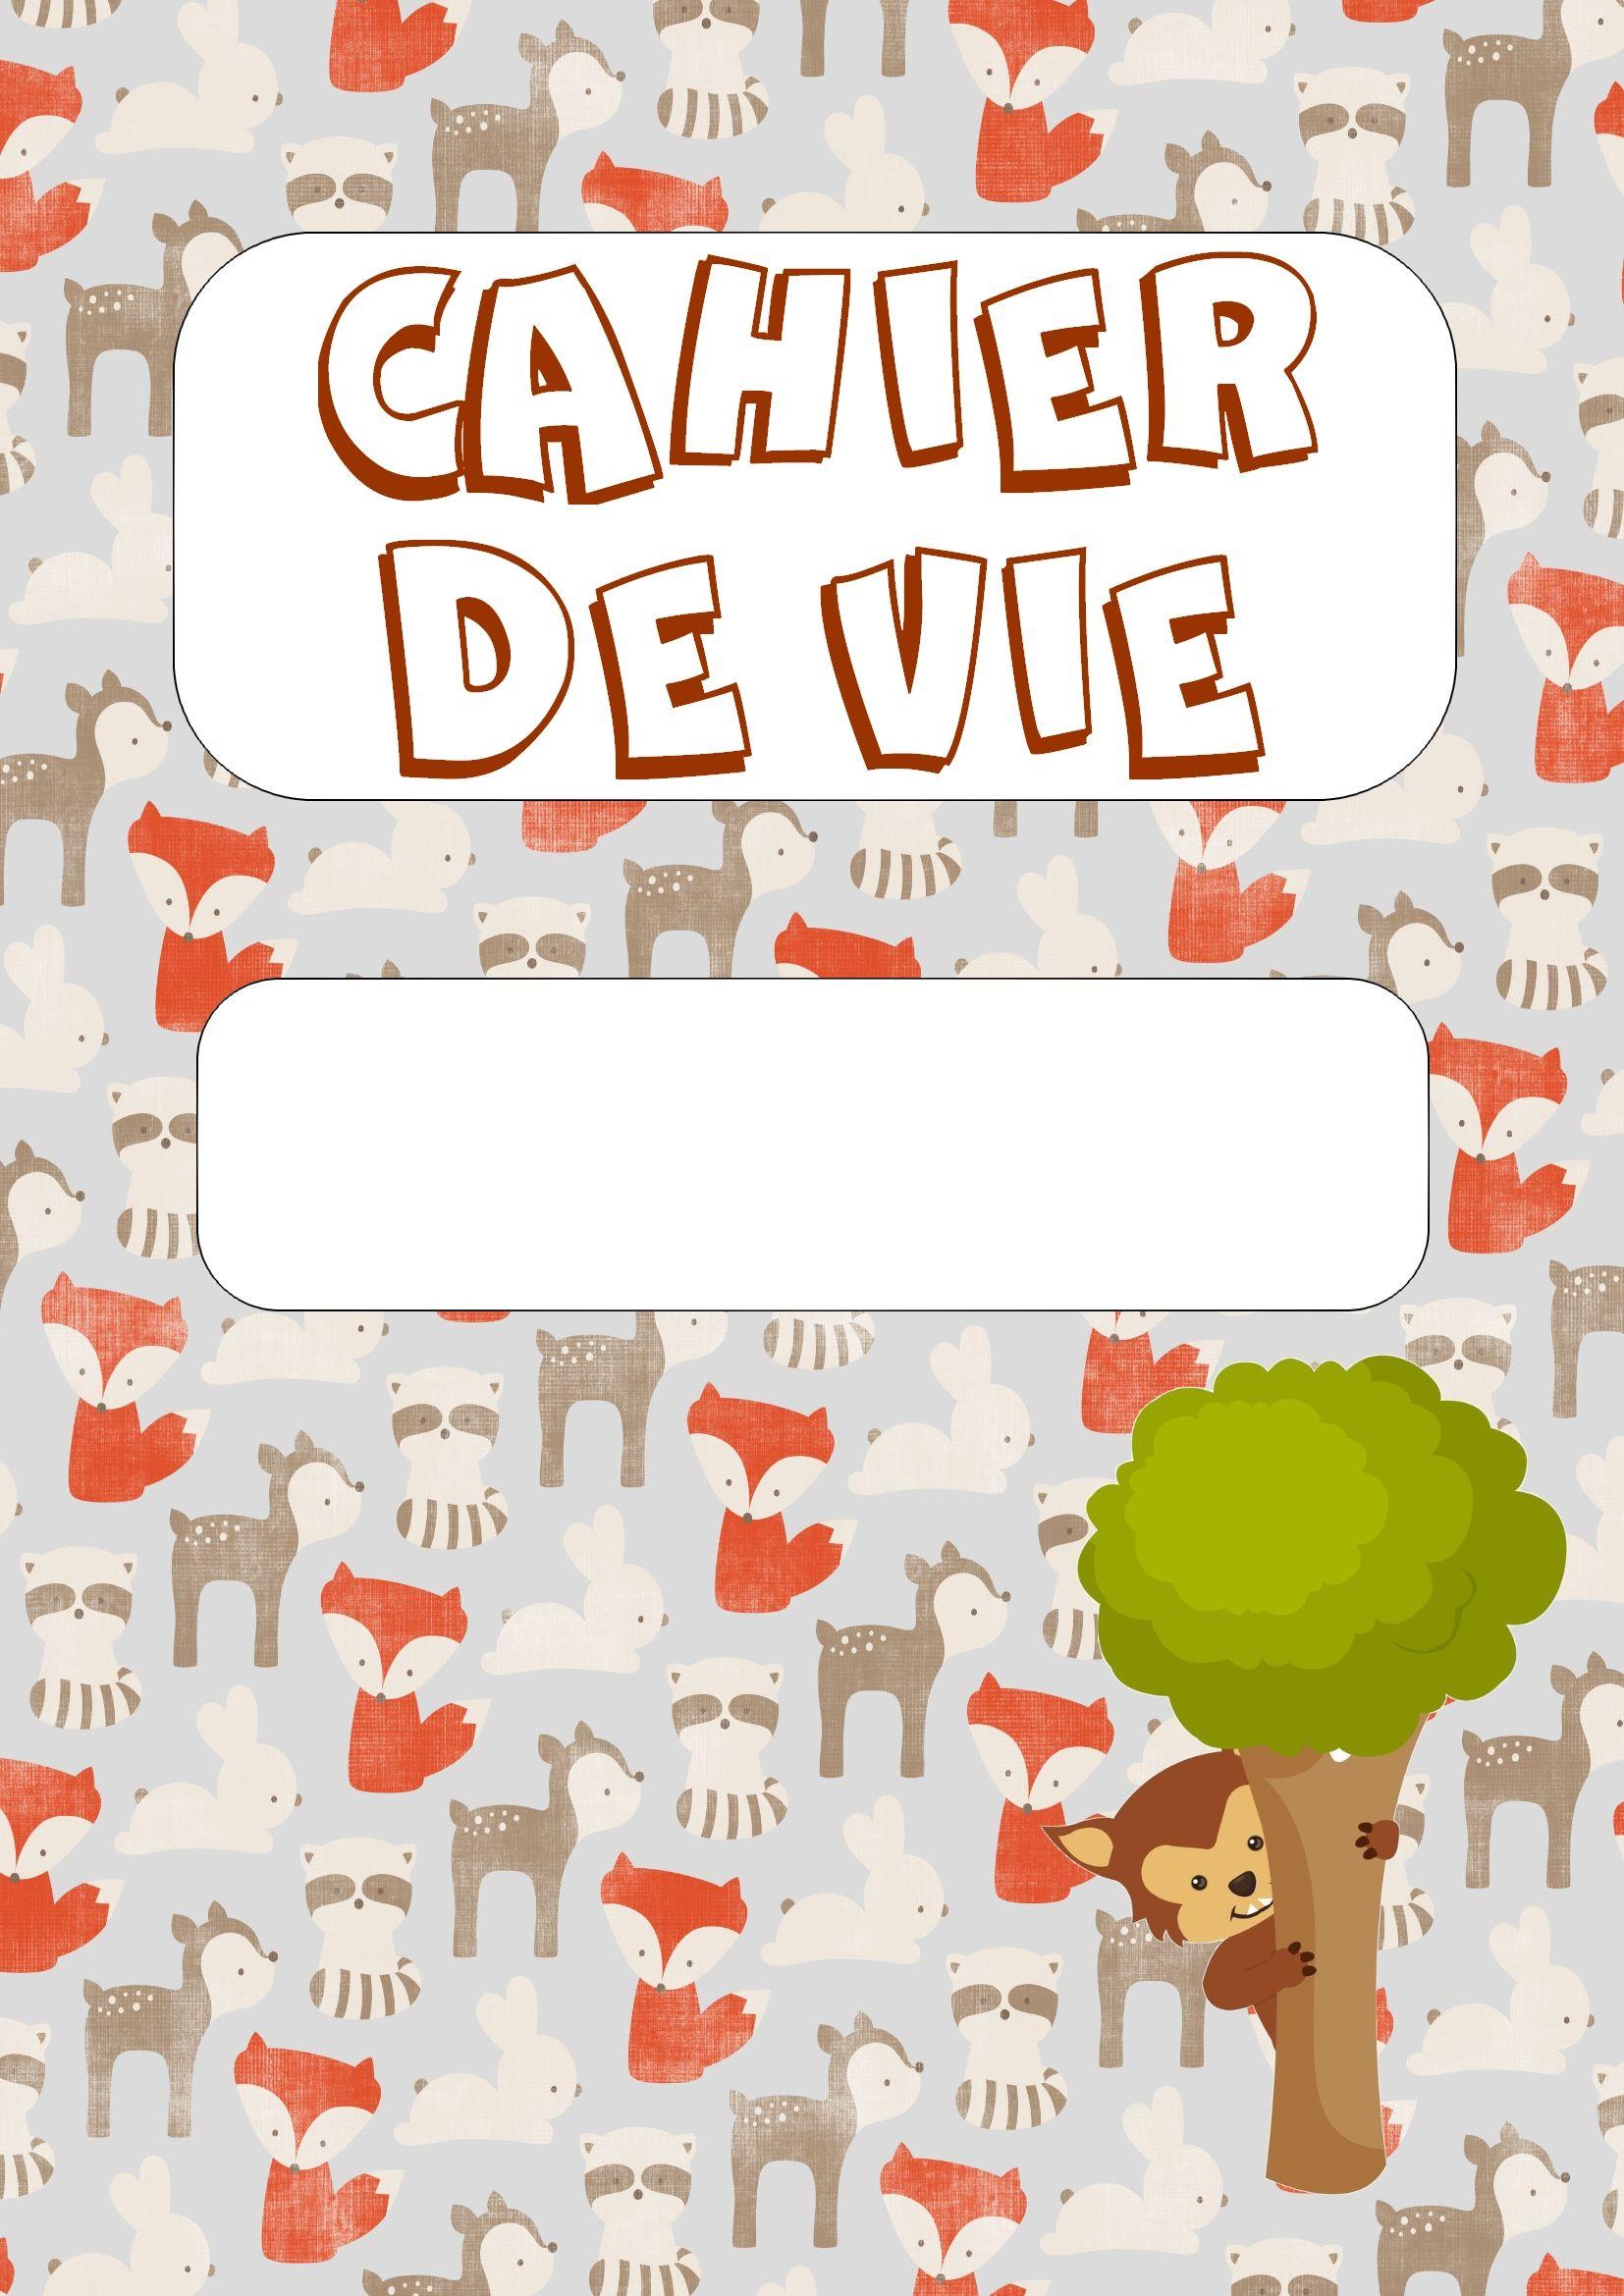 Cahier De Liaison Cahier De Vie Cahier De Vie Cahier De Vie Maternelle Cahier De Liaison